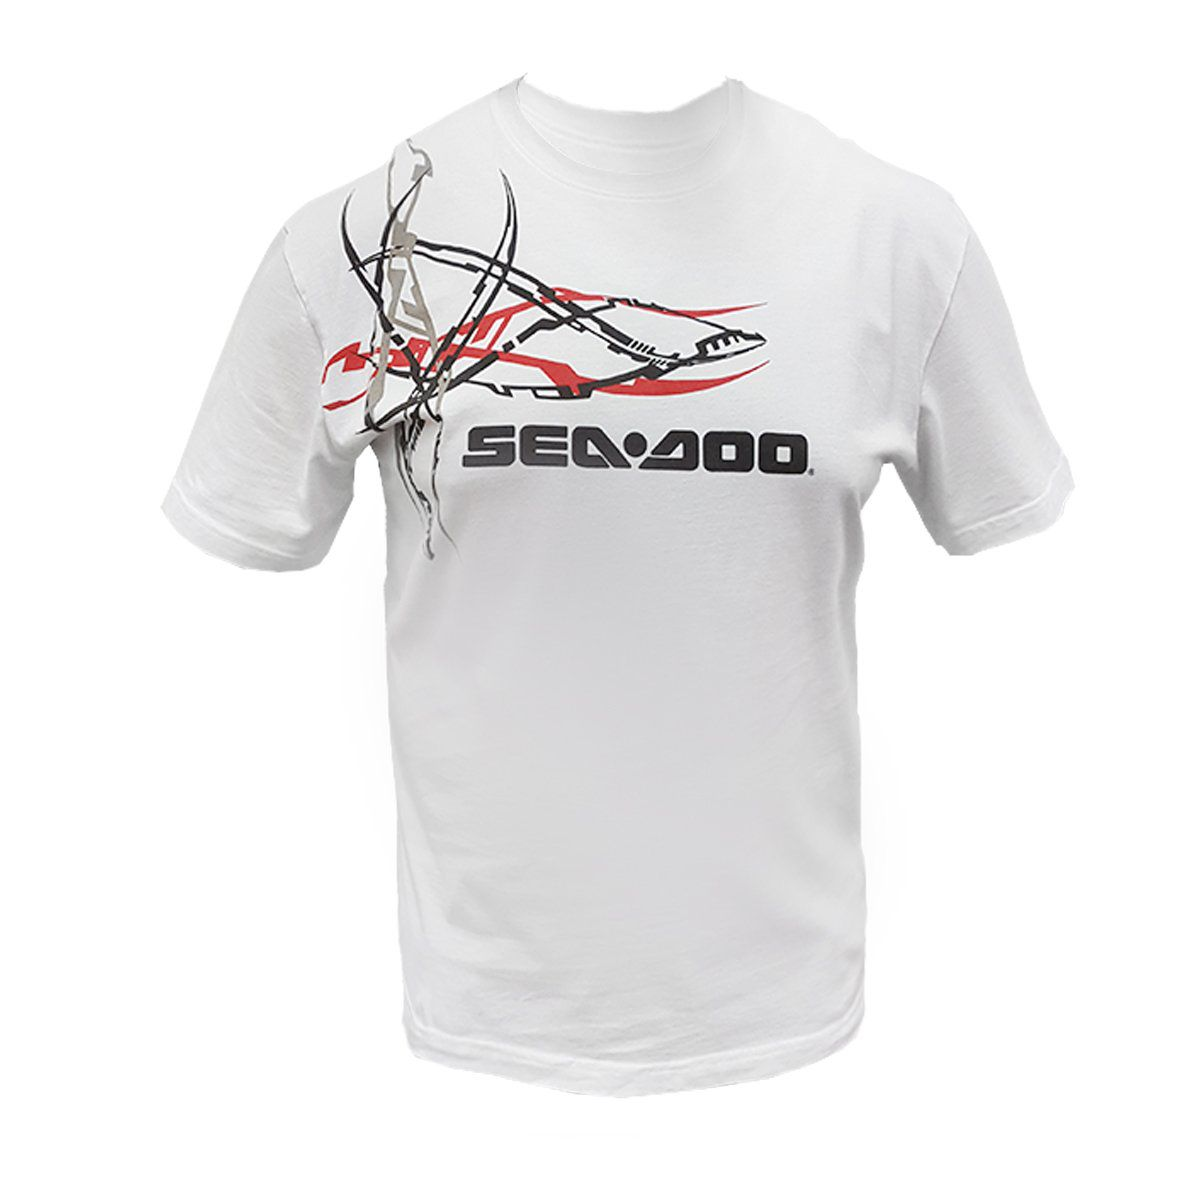 Camiseta Tee Sea-Doo Masculina Branca